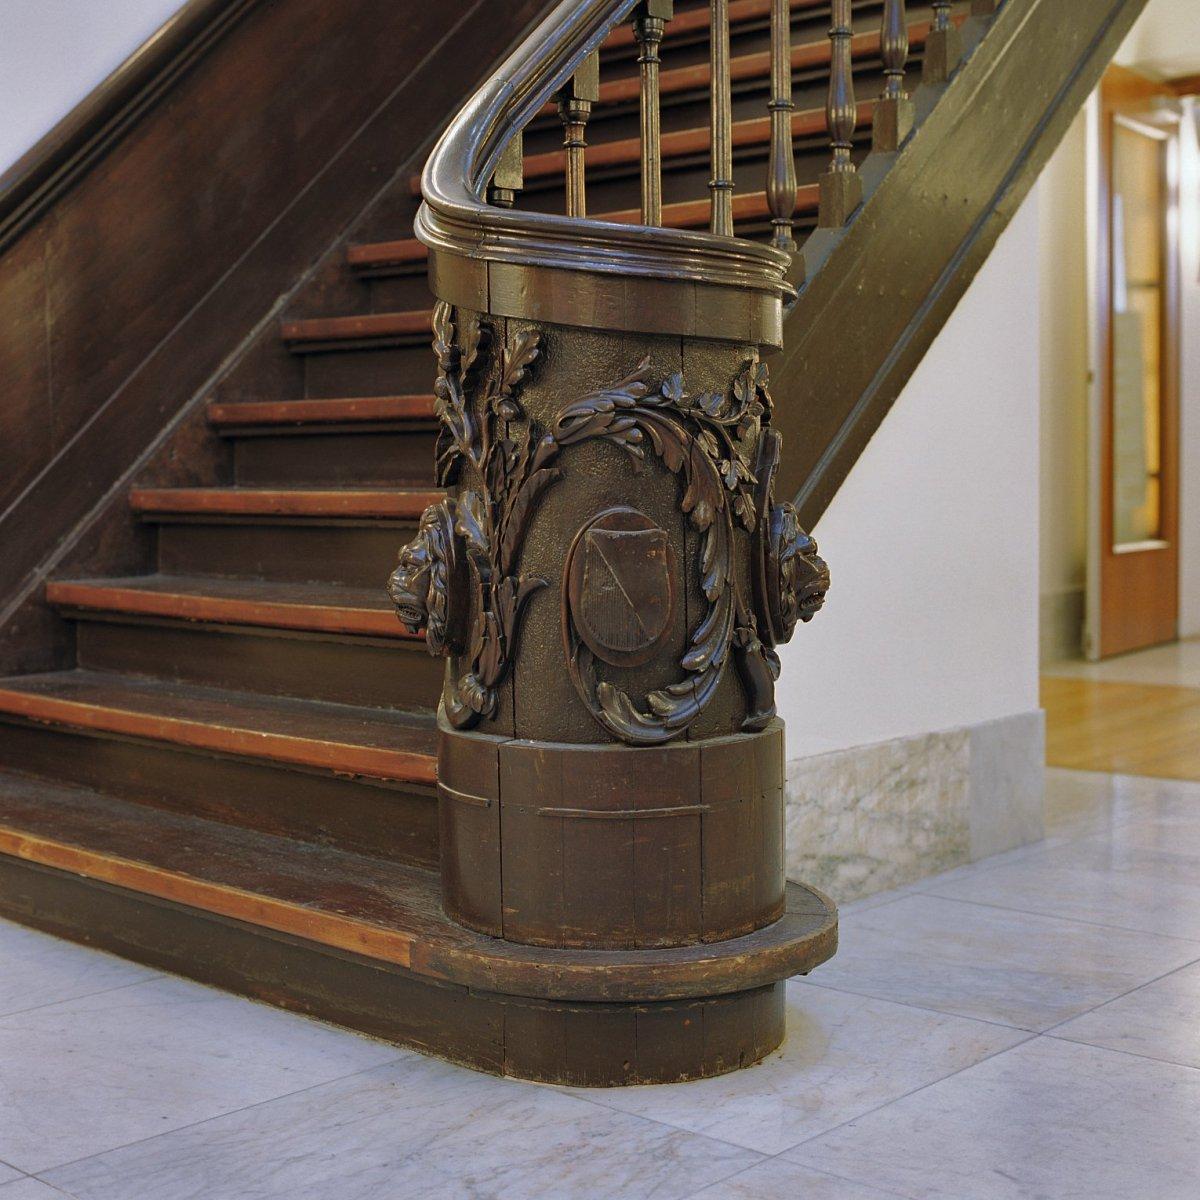 File interieur houtsnijwerk op monumentale trap op de begane grond utrecht 20382322 rce - Interieur trap ...